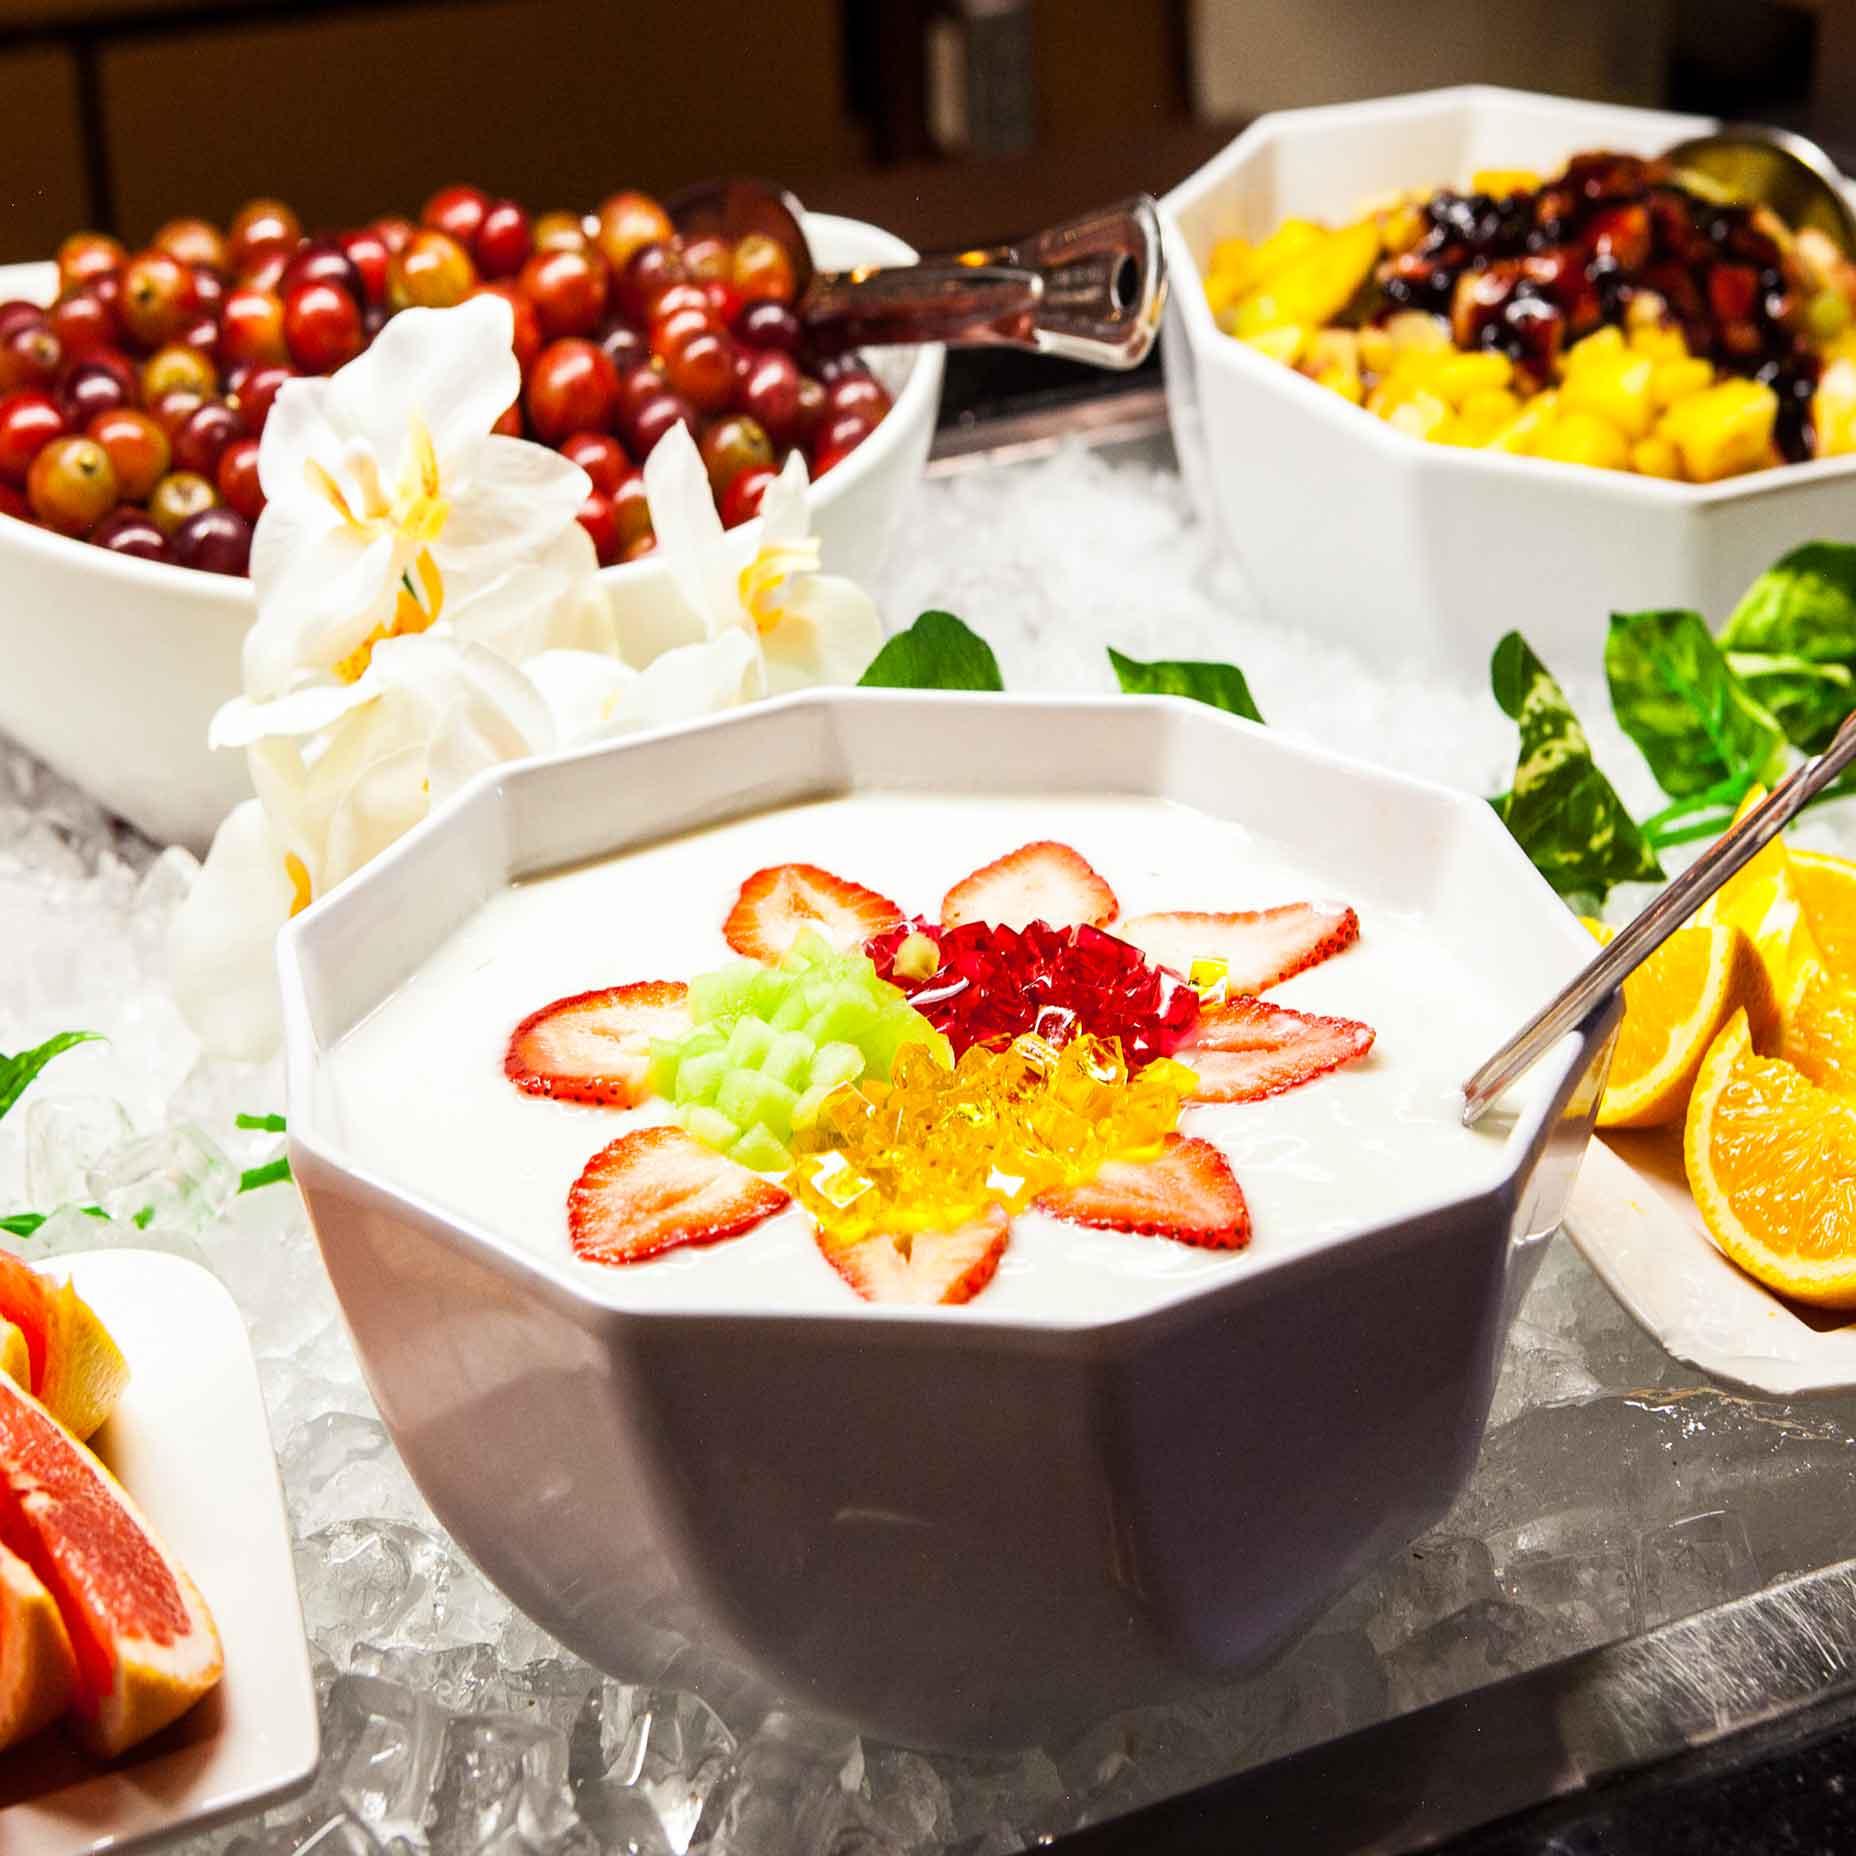 Wok Of Fame - All you can eat buffet in Brampton - Dessert Bar